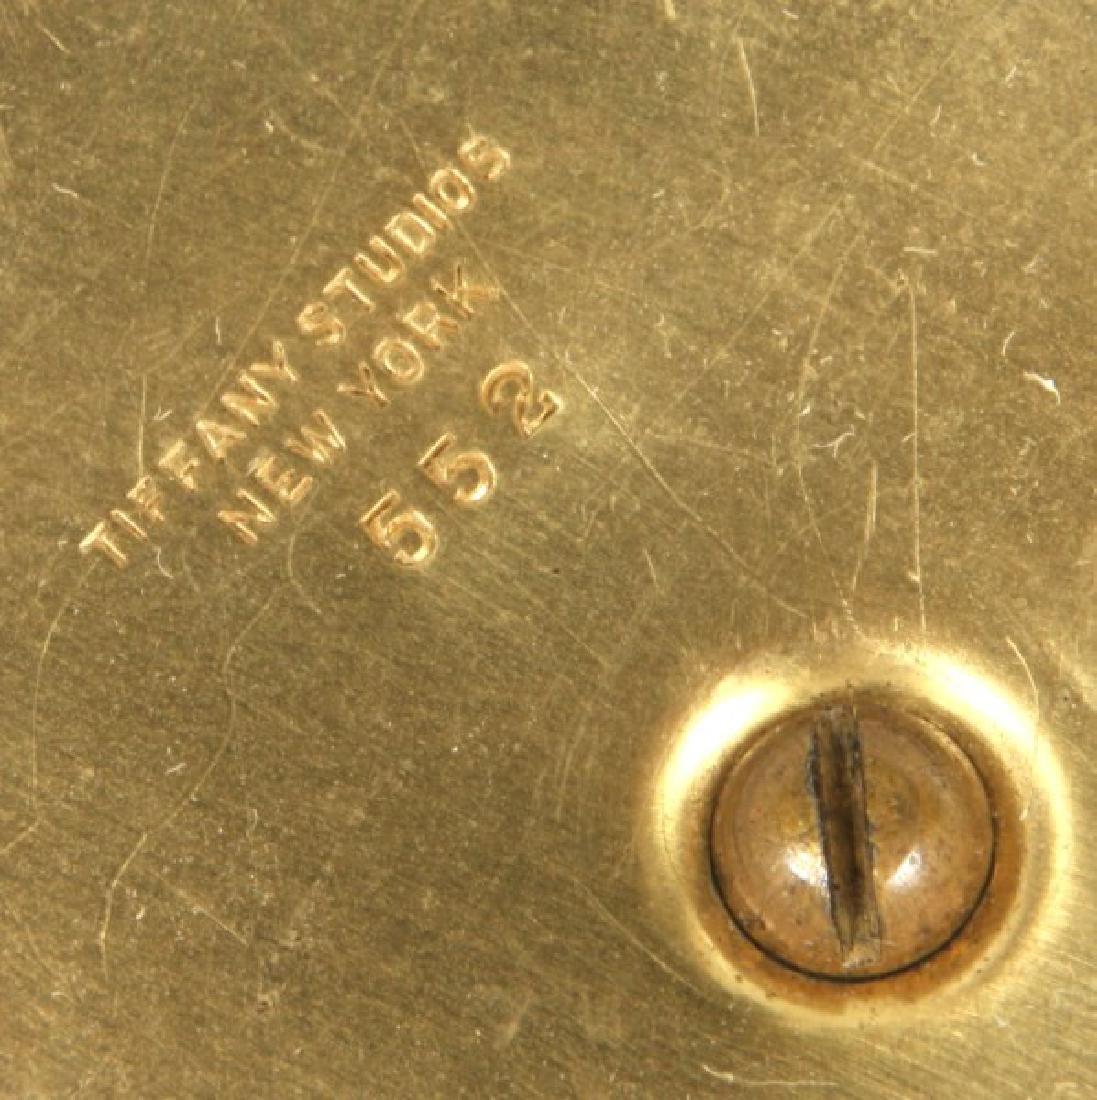 Tiffany Studios No. 552 Pine Needle Desk Lamp - 5